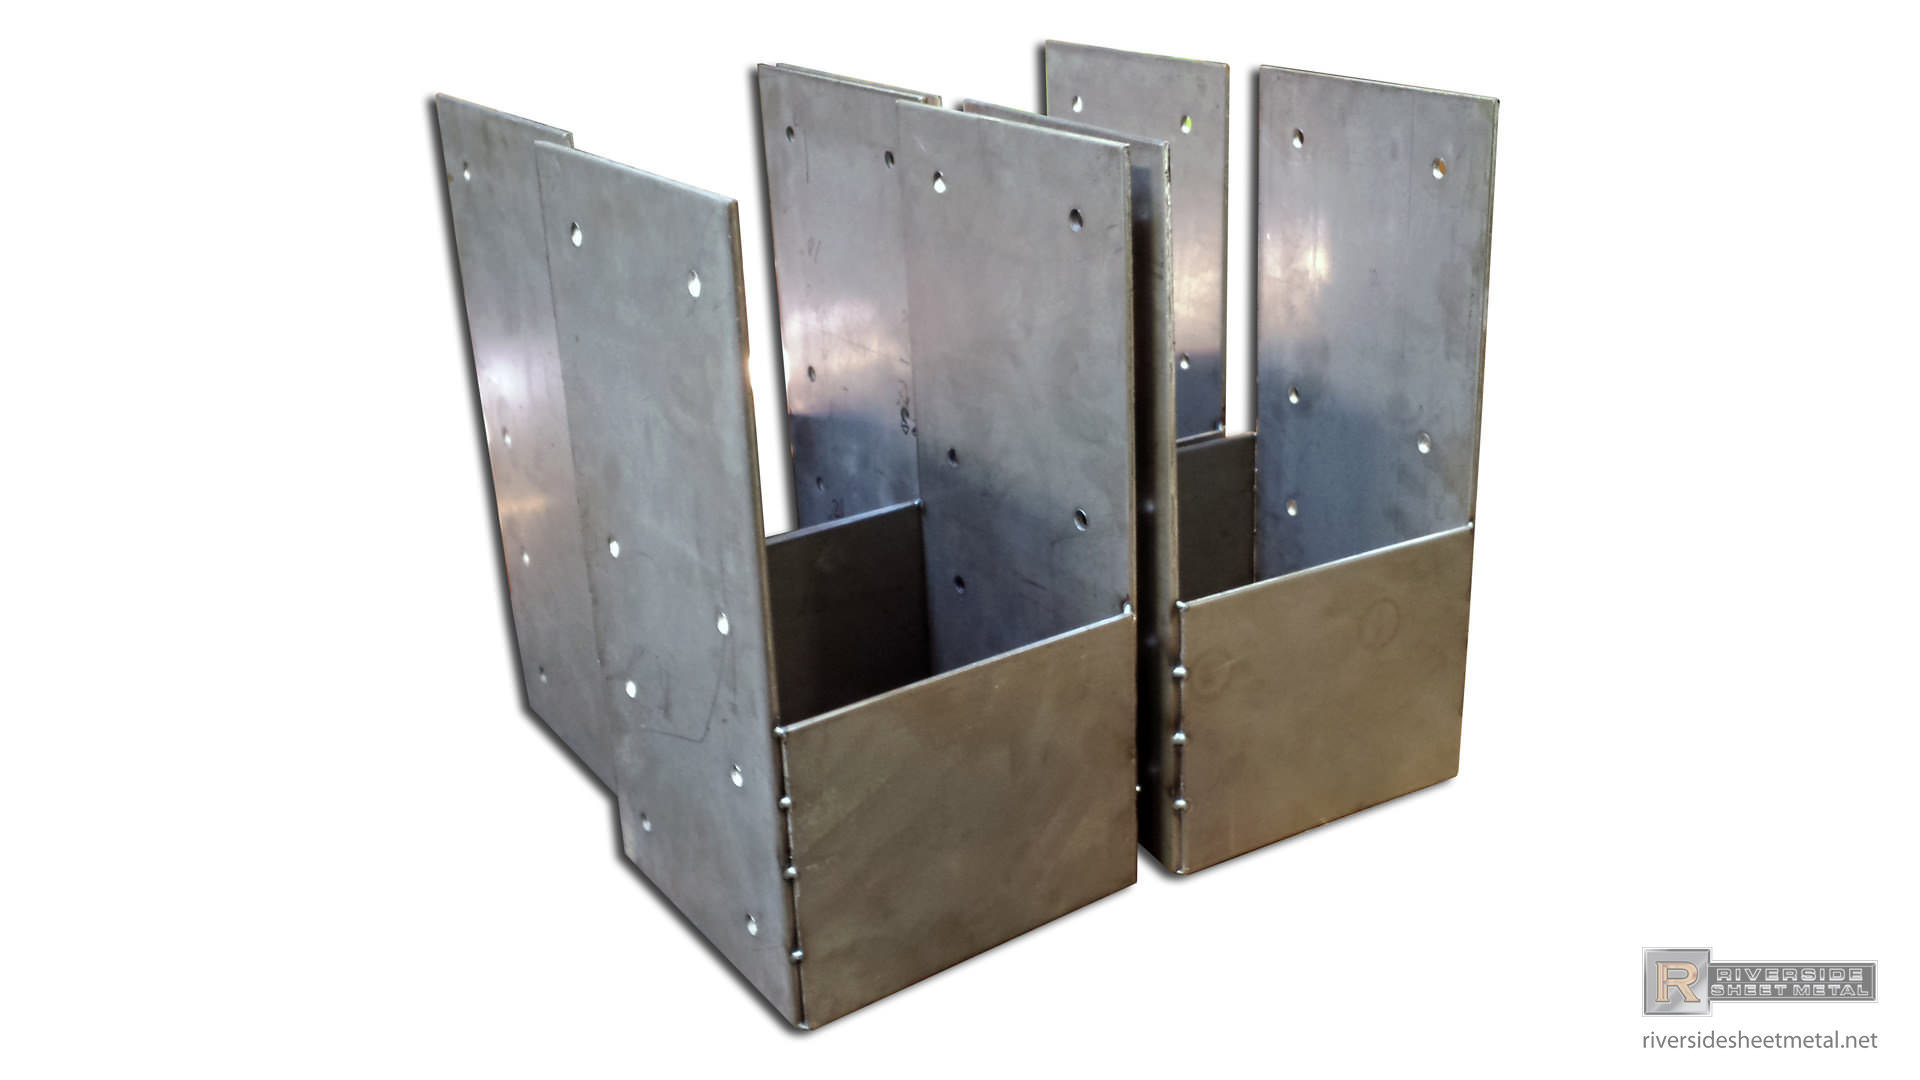 Steel Bracket For Wooden Beams Massachusetts Sheet Metal